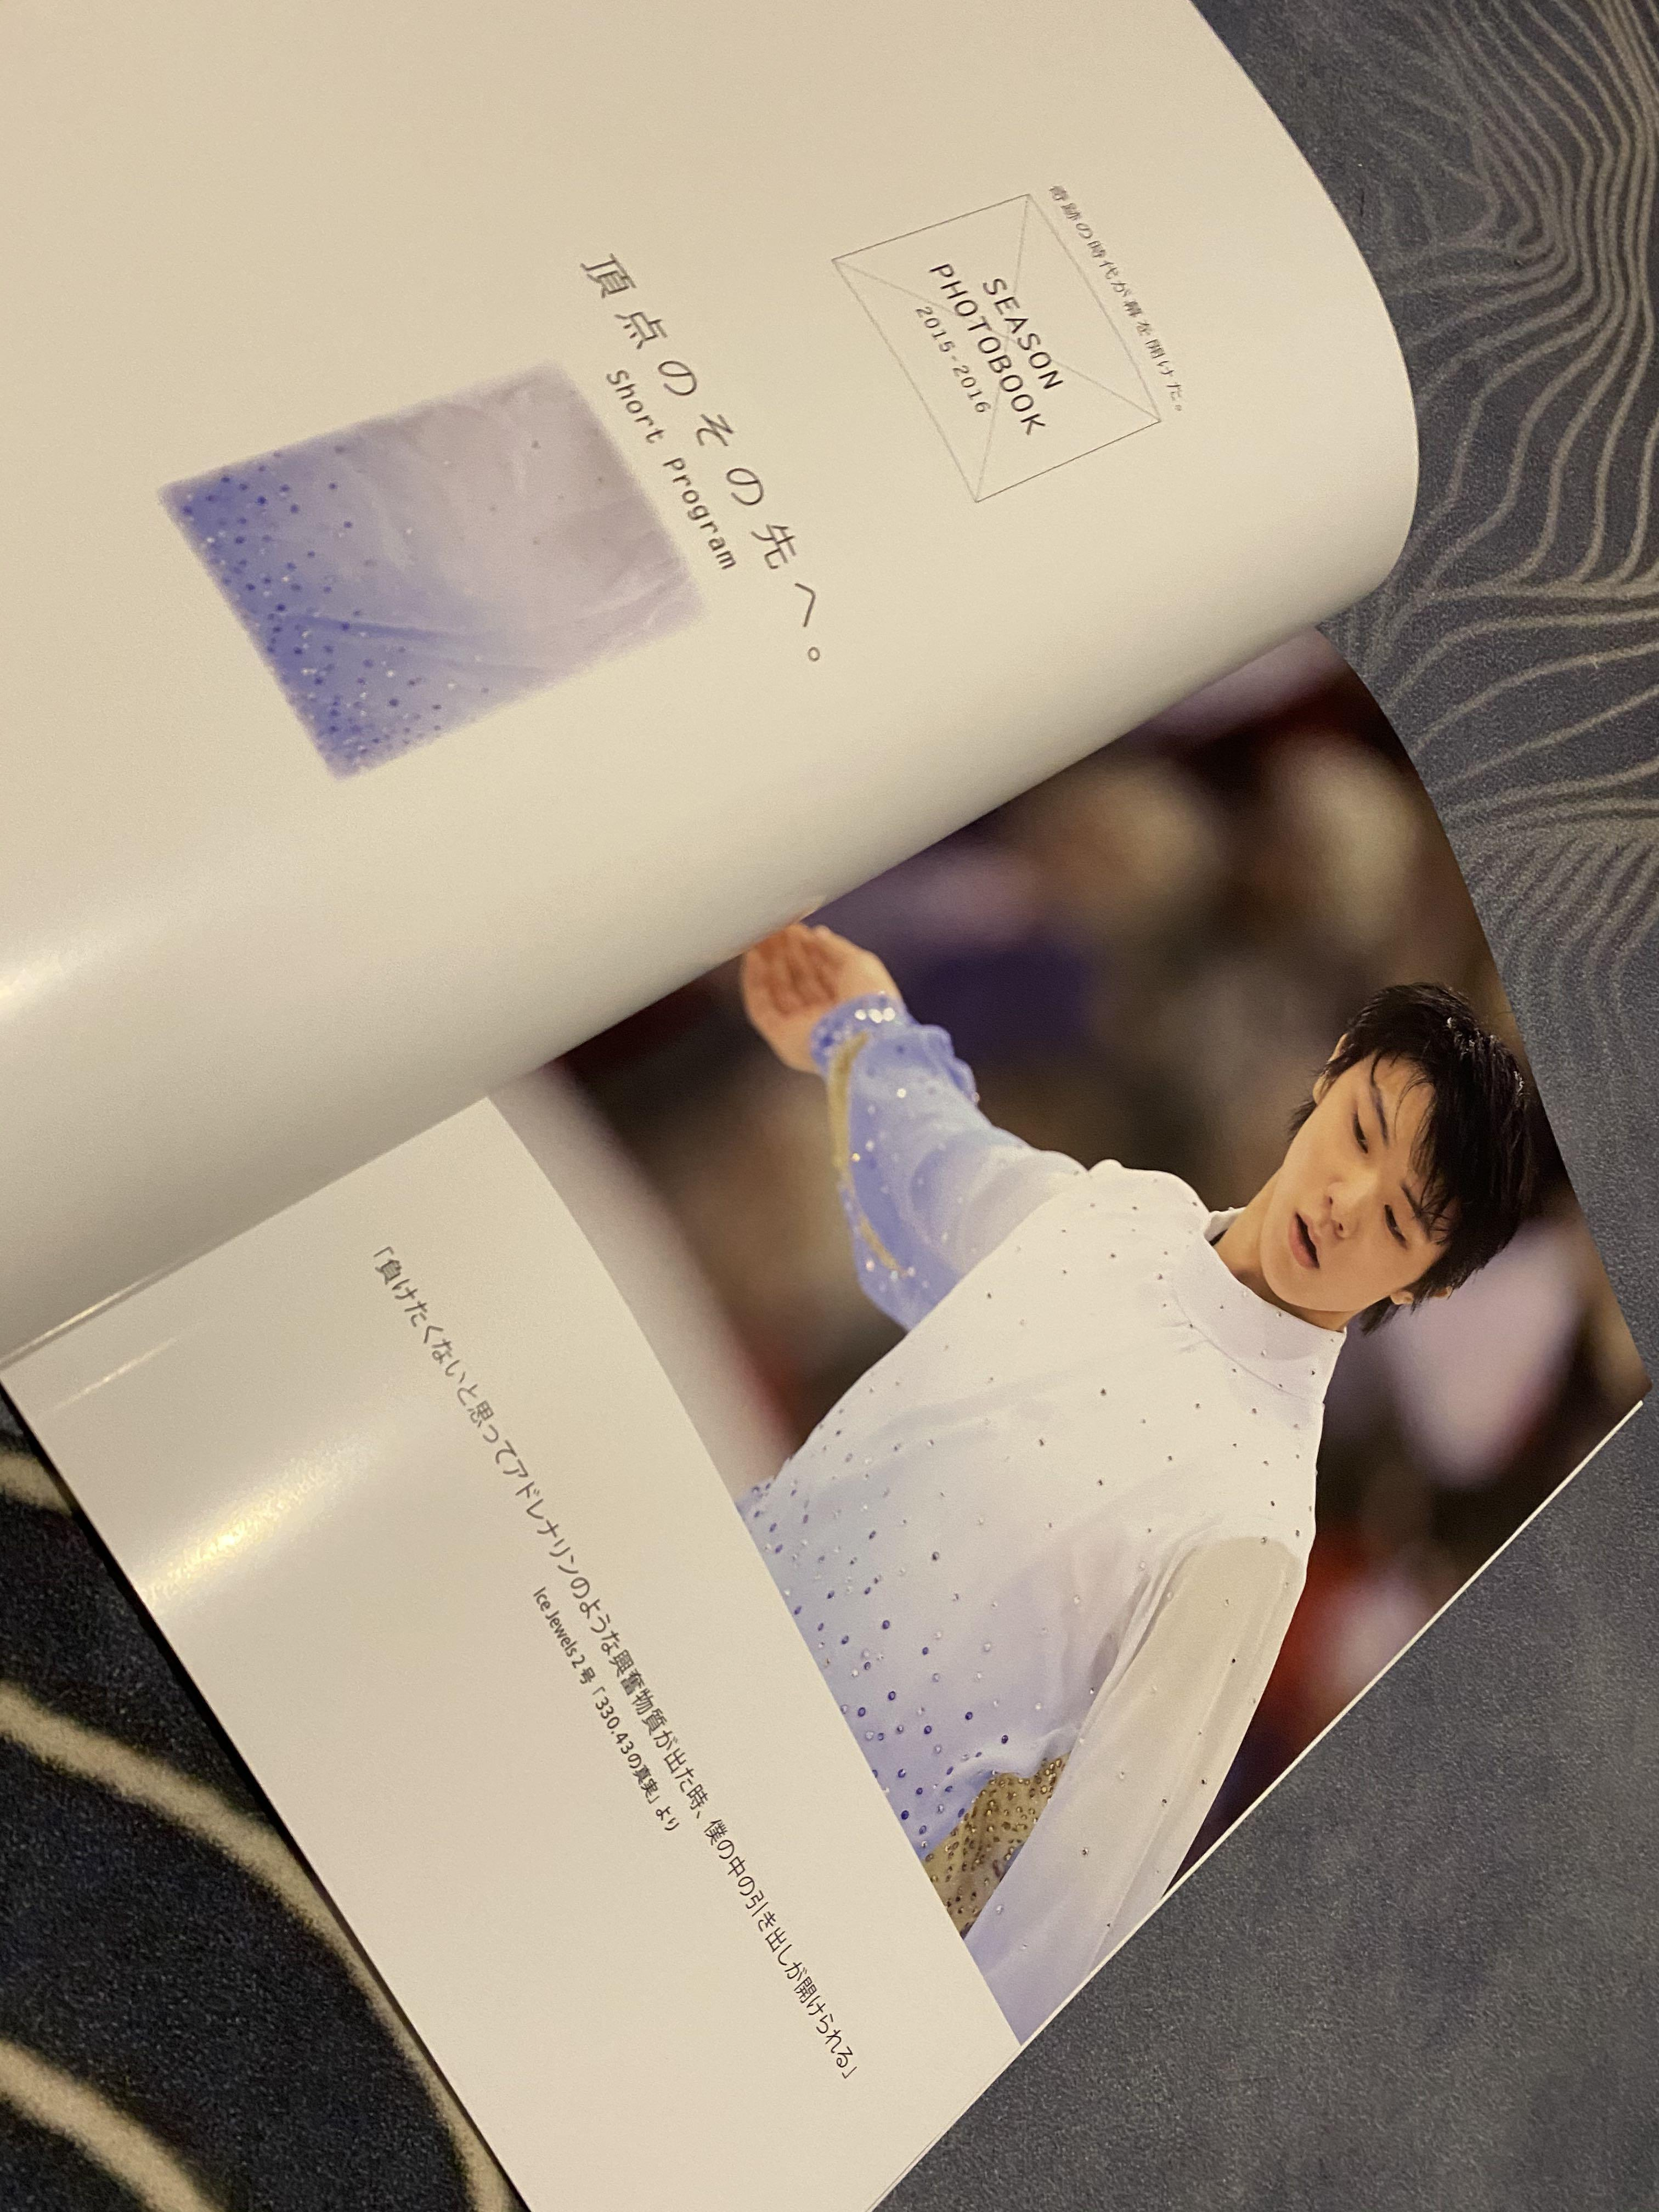 羽生結弦 2015-2016 season photo book